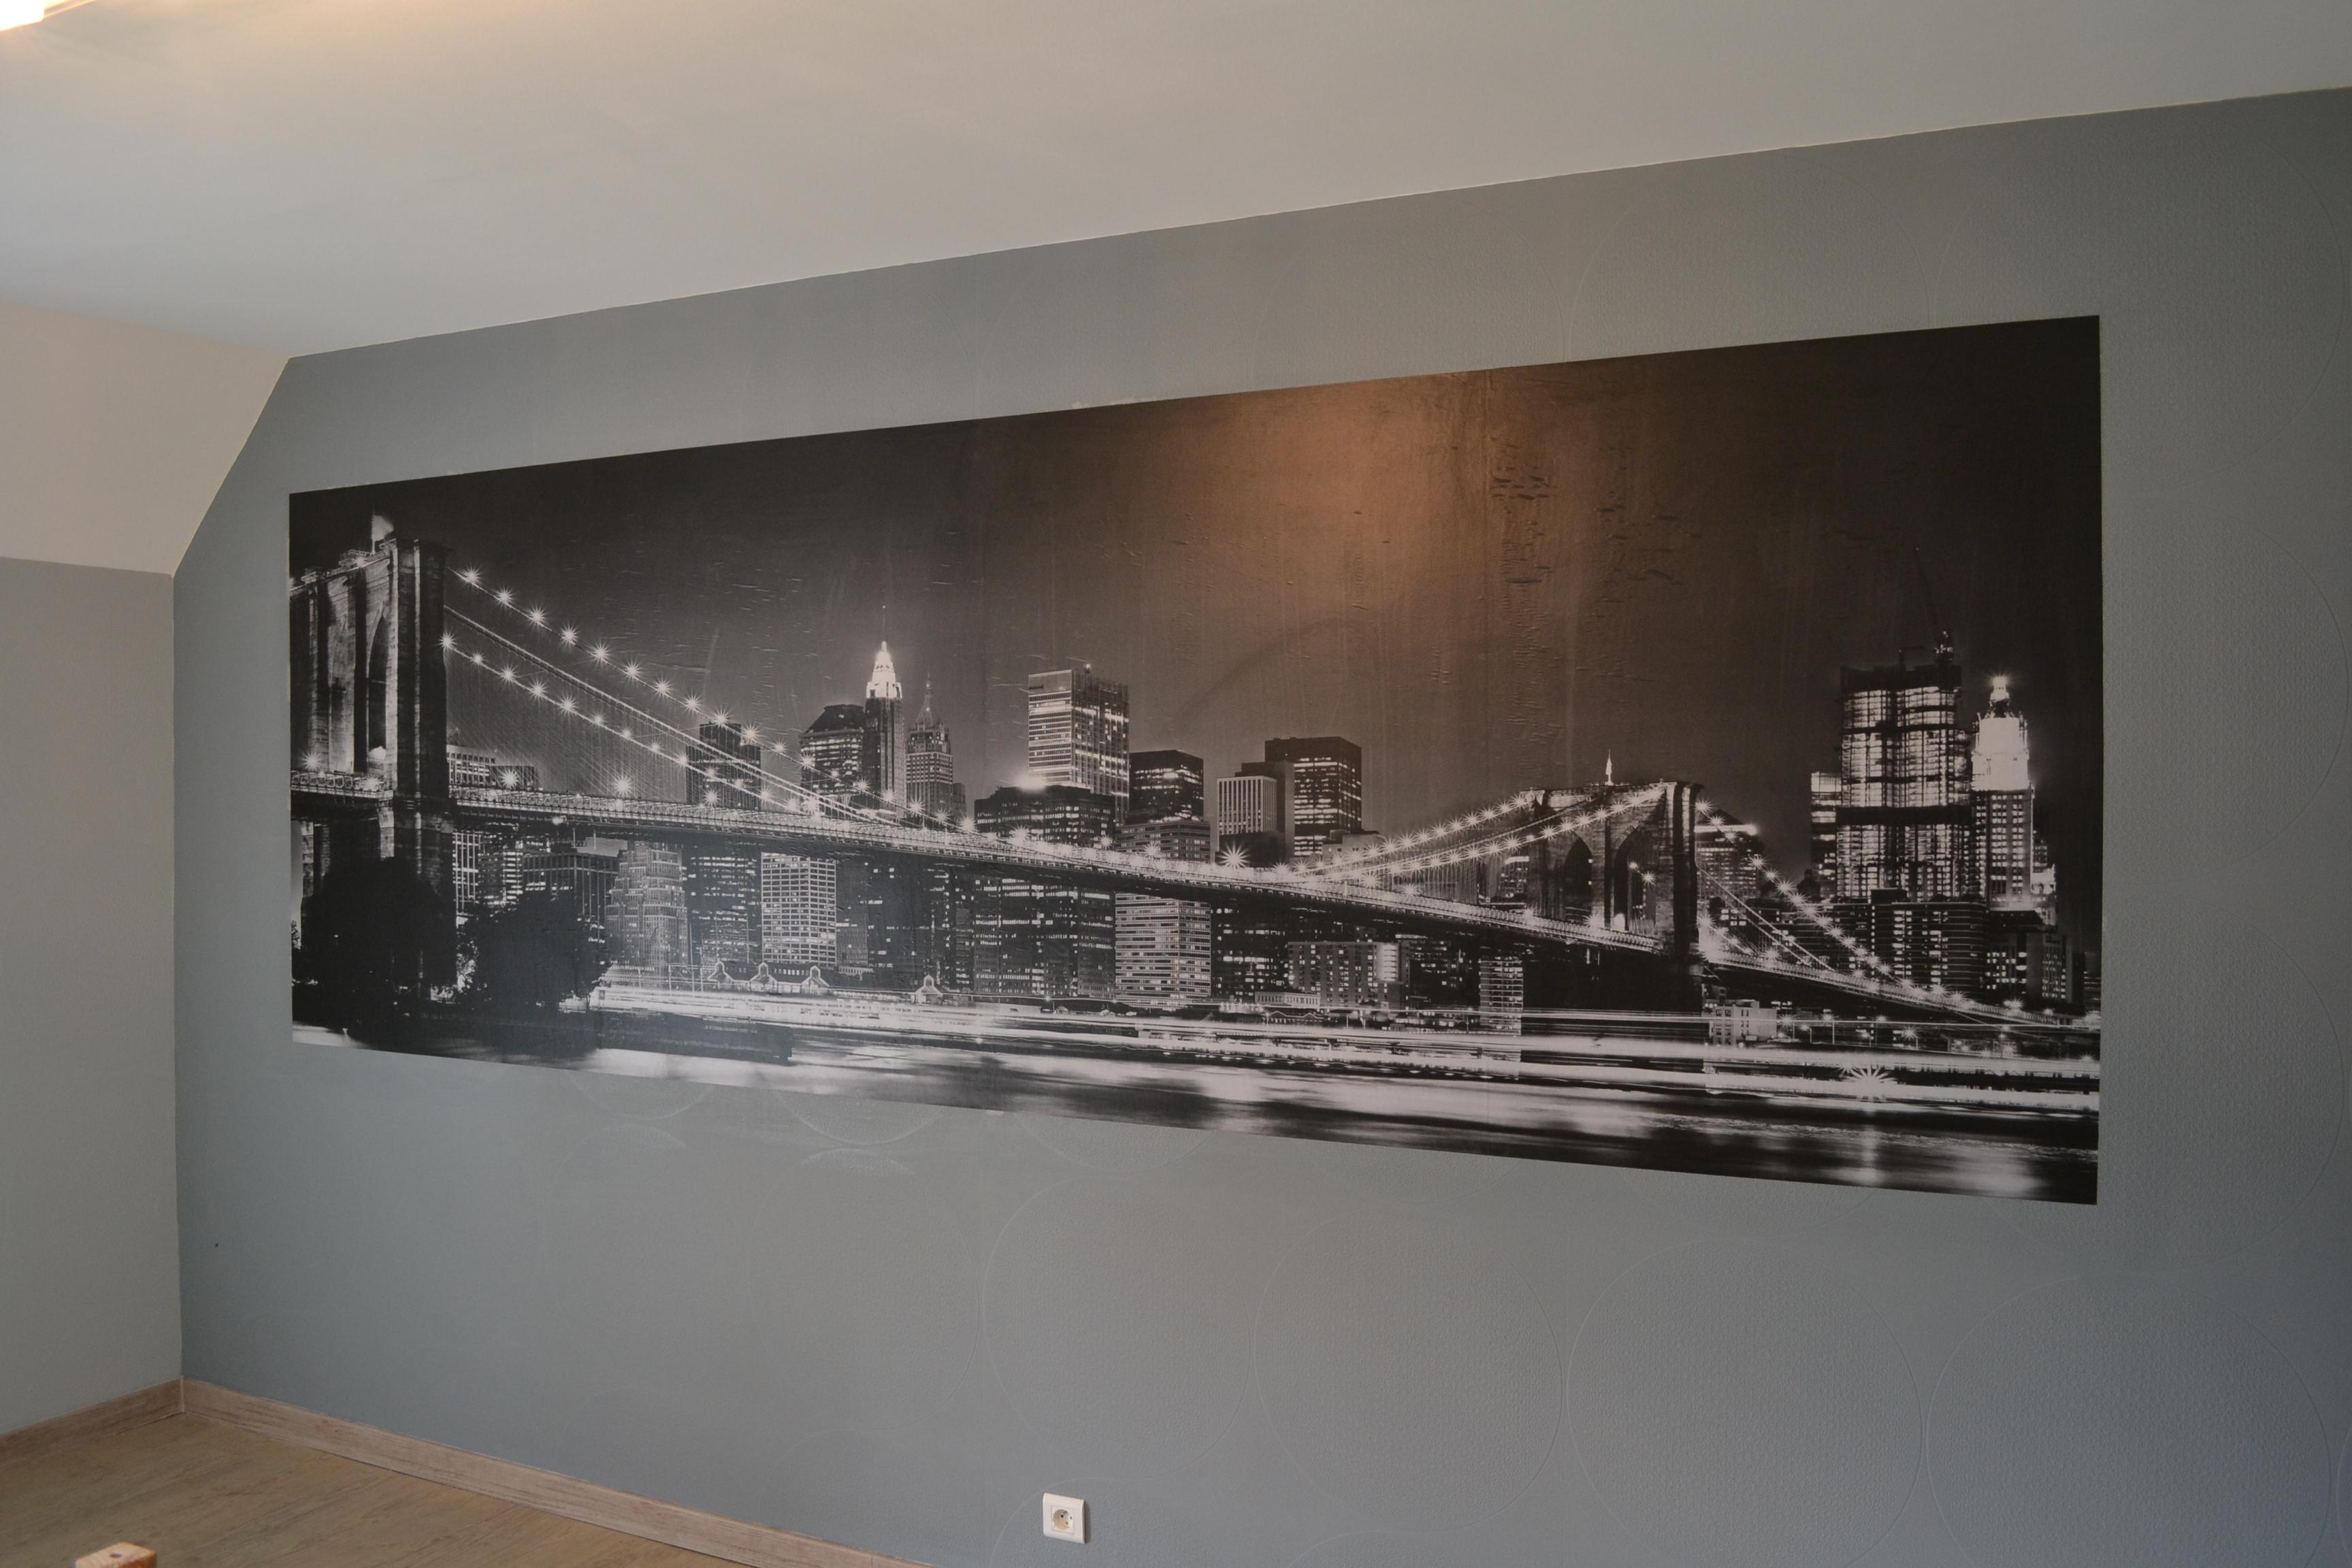 3-PAPIER-PEINT-POSTER-328x127cm-4NW-320-Brooklyn-Bridge-KOMAR